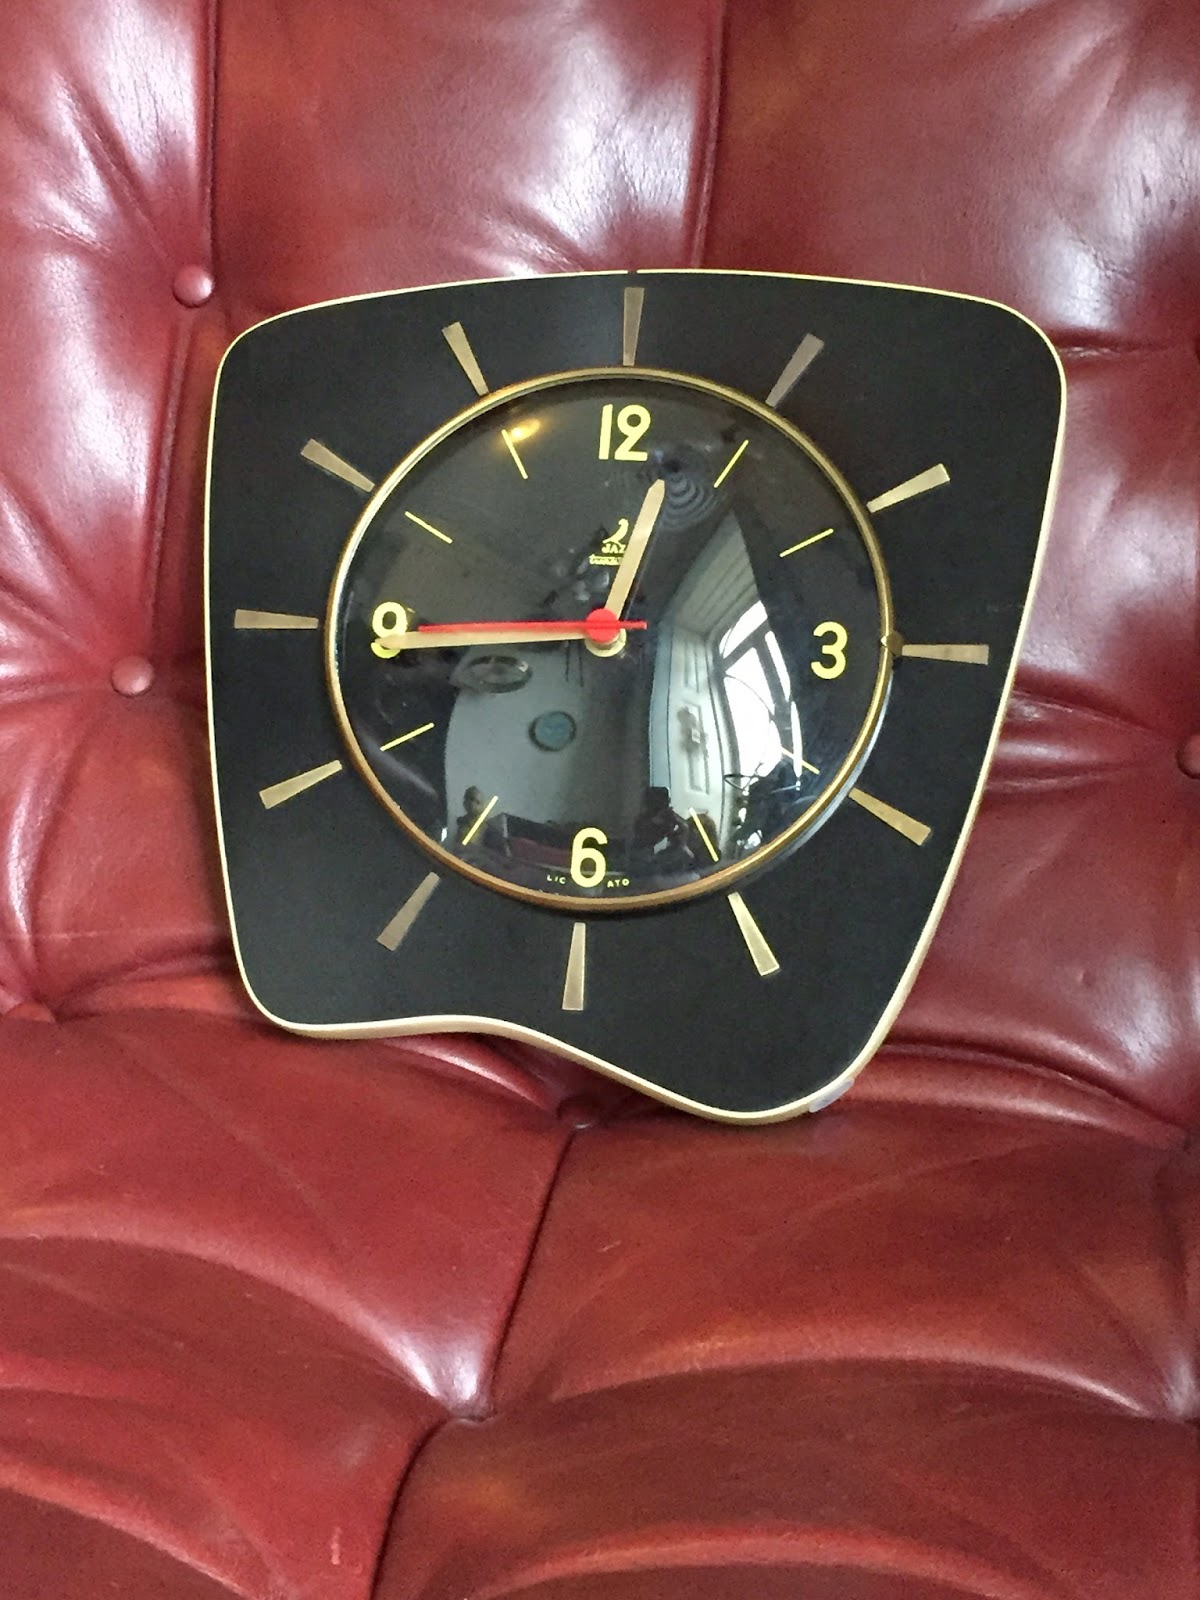 relógio vintage, made in france, relógio Jaz, decoração vintage, anos 50